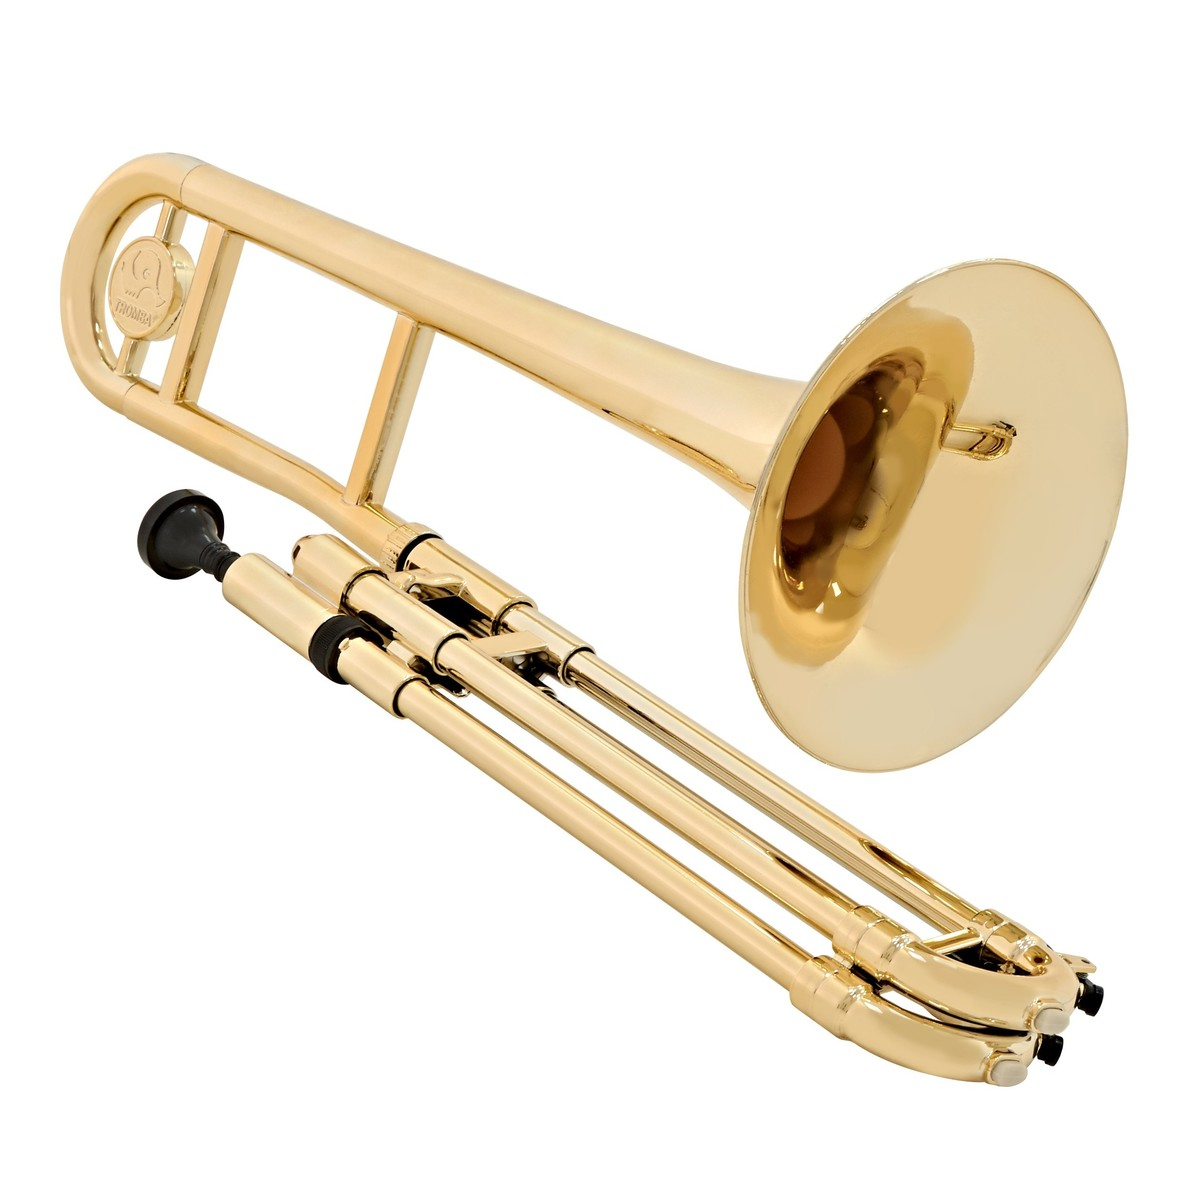 DISC Tromba Plastic Jazzbone, Gold